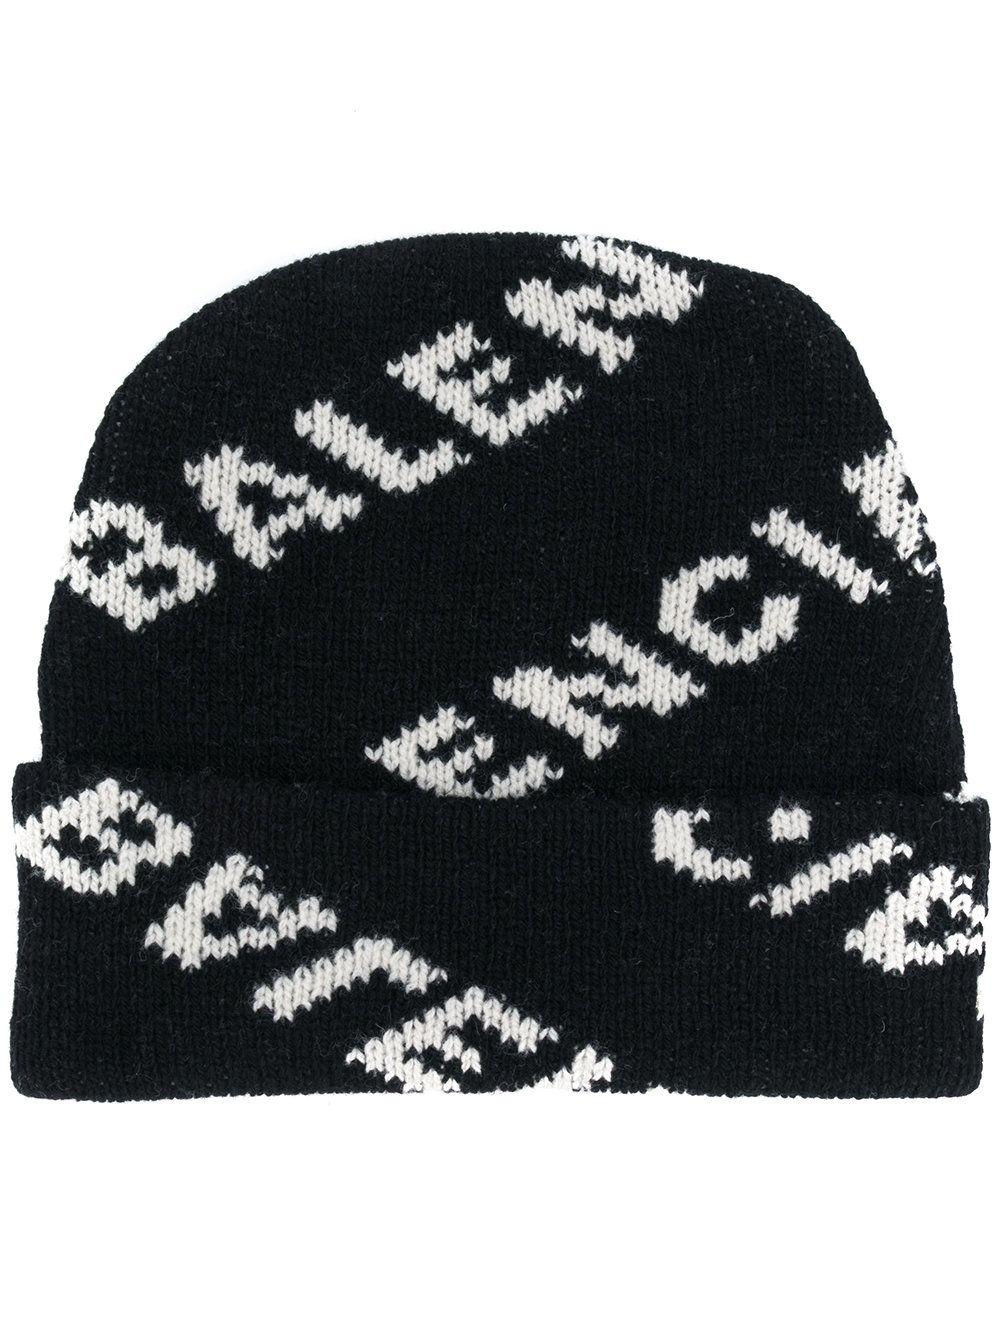 4b6c8953b0f BALENCIAGA logo刺绣针织帽.  balenciaga